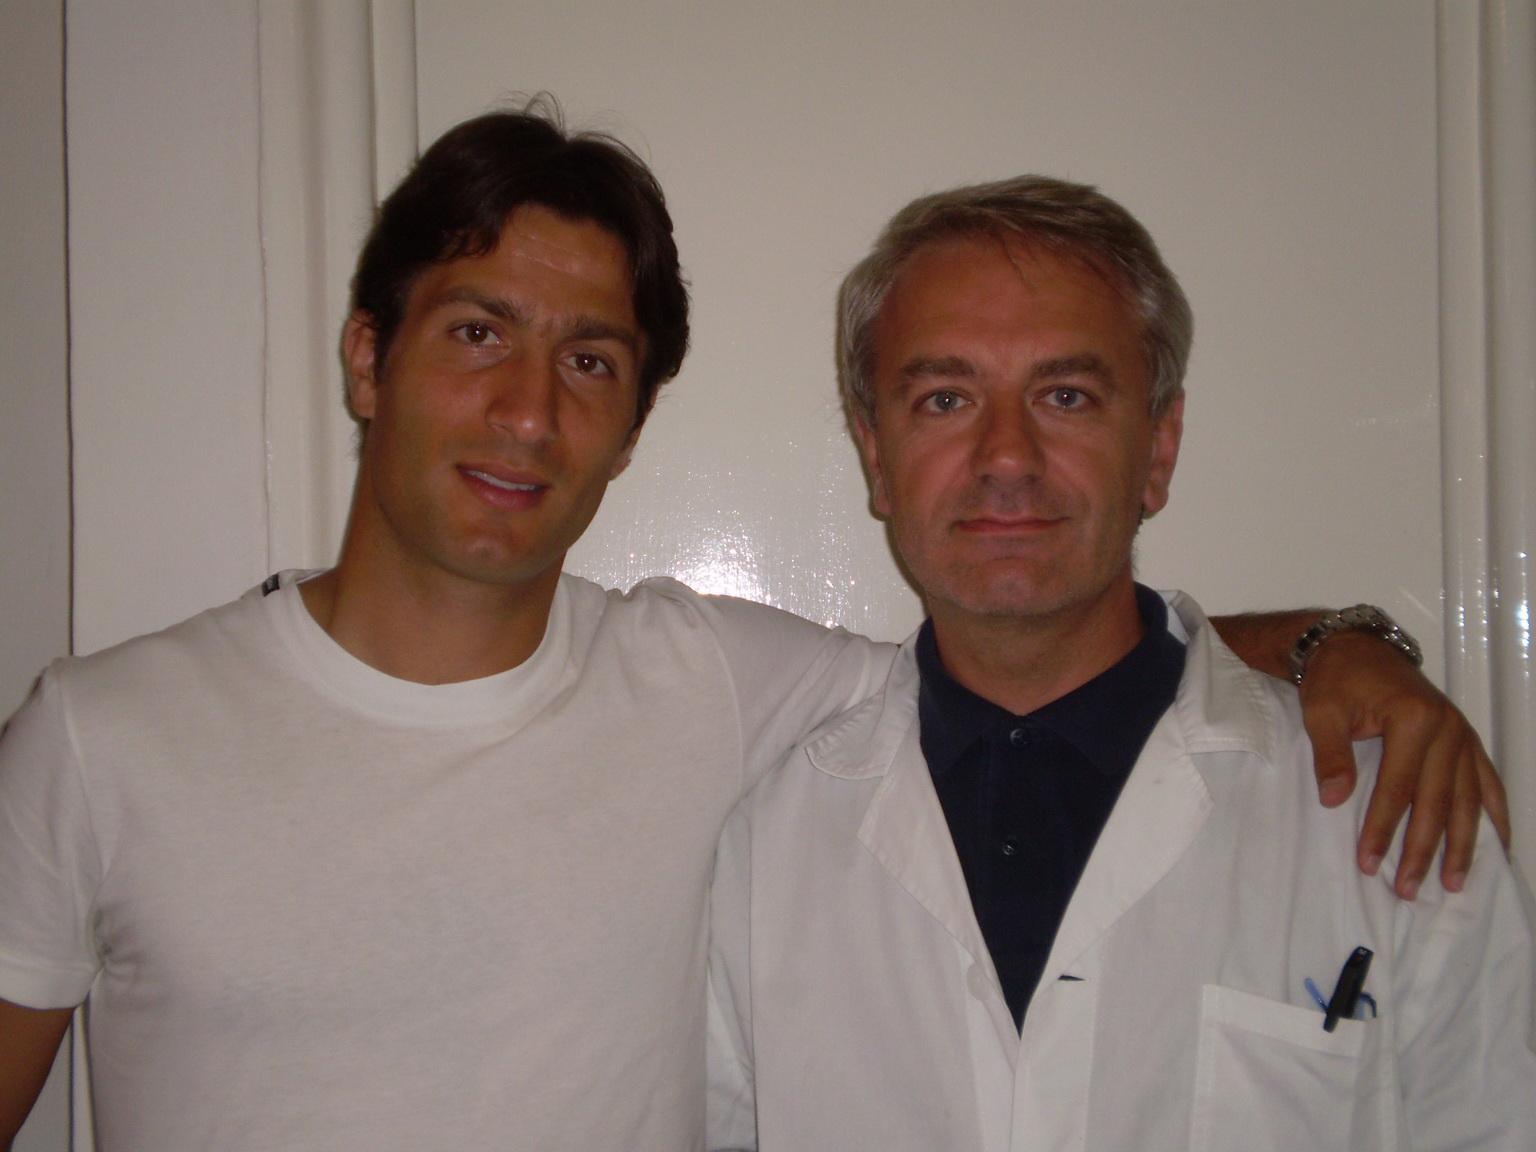 Giuseppe Sculli